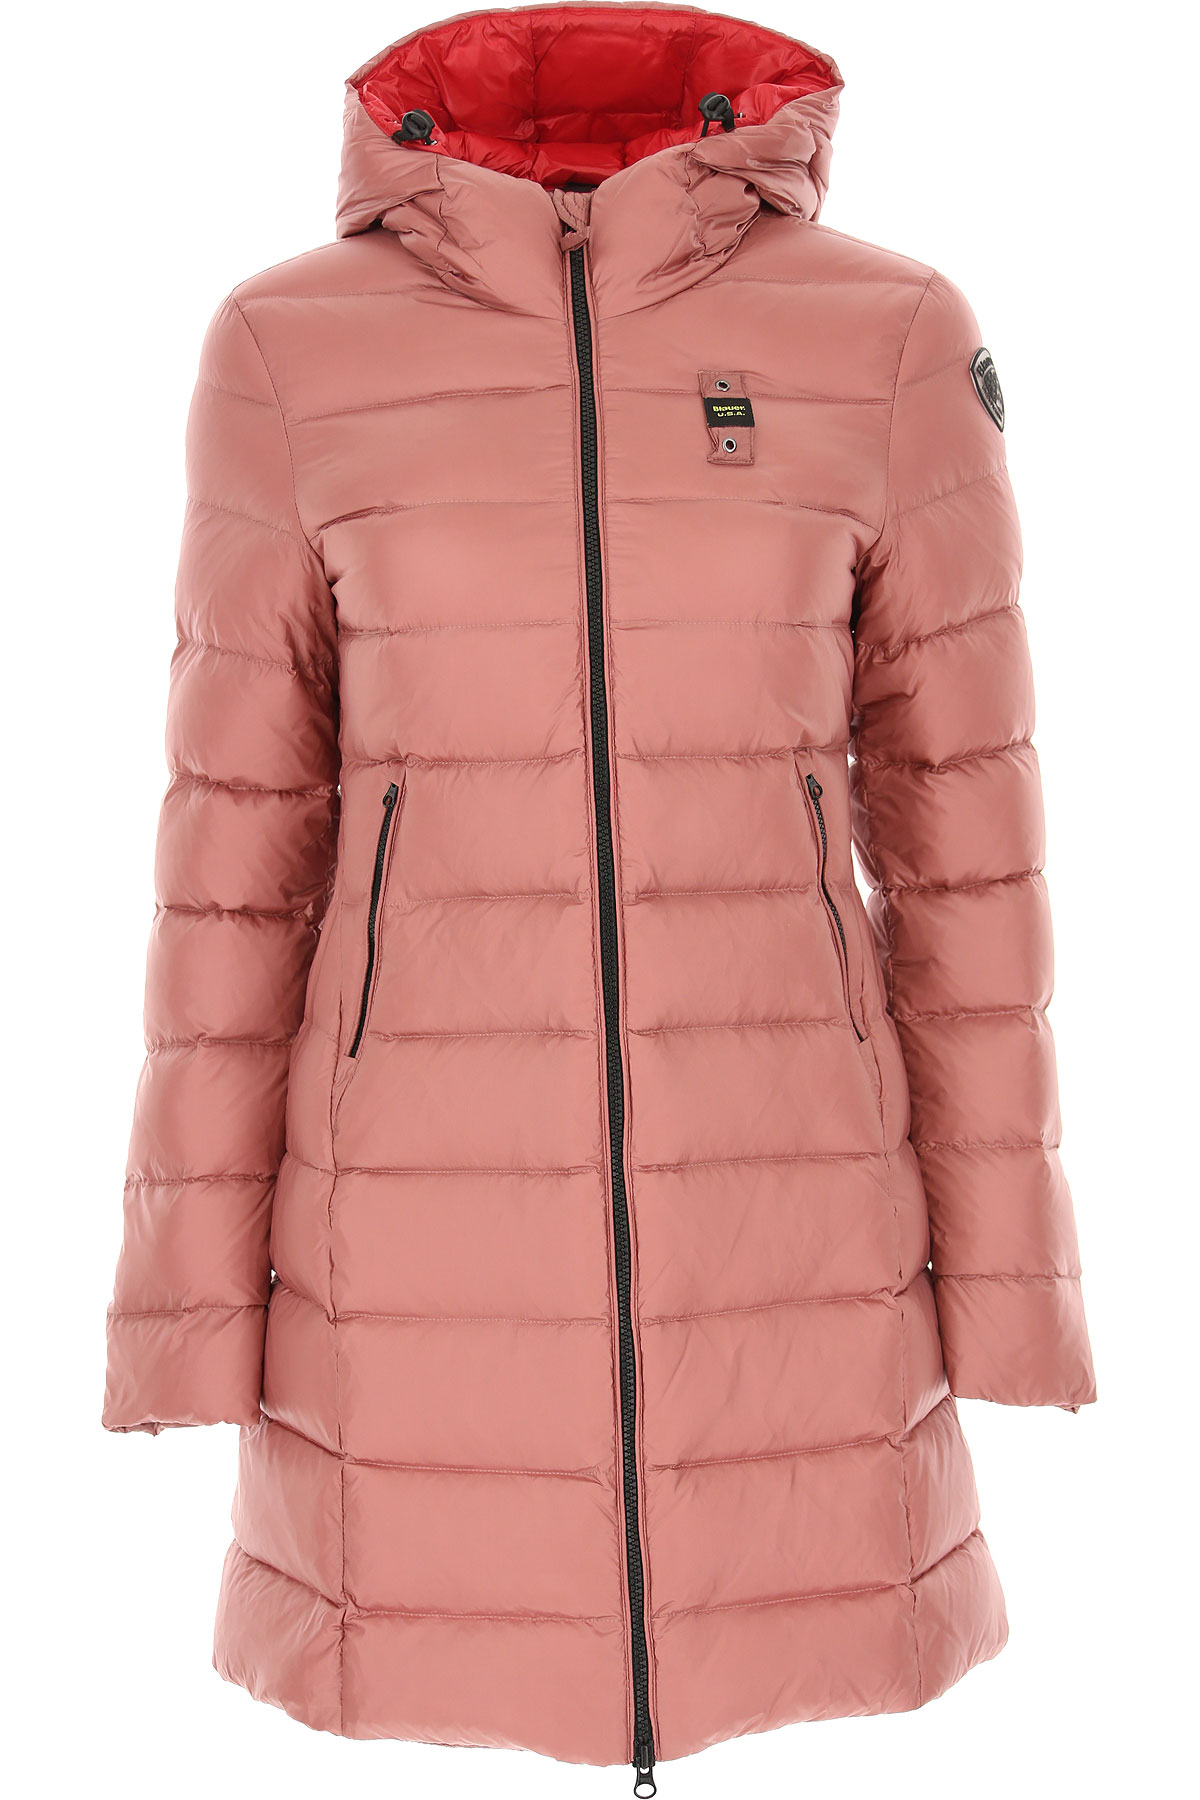 Blauer Down Jacket for Women, Puffer Ski Jacket On Sale, blush, polyester, 2019, 2 4 6 8